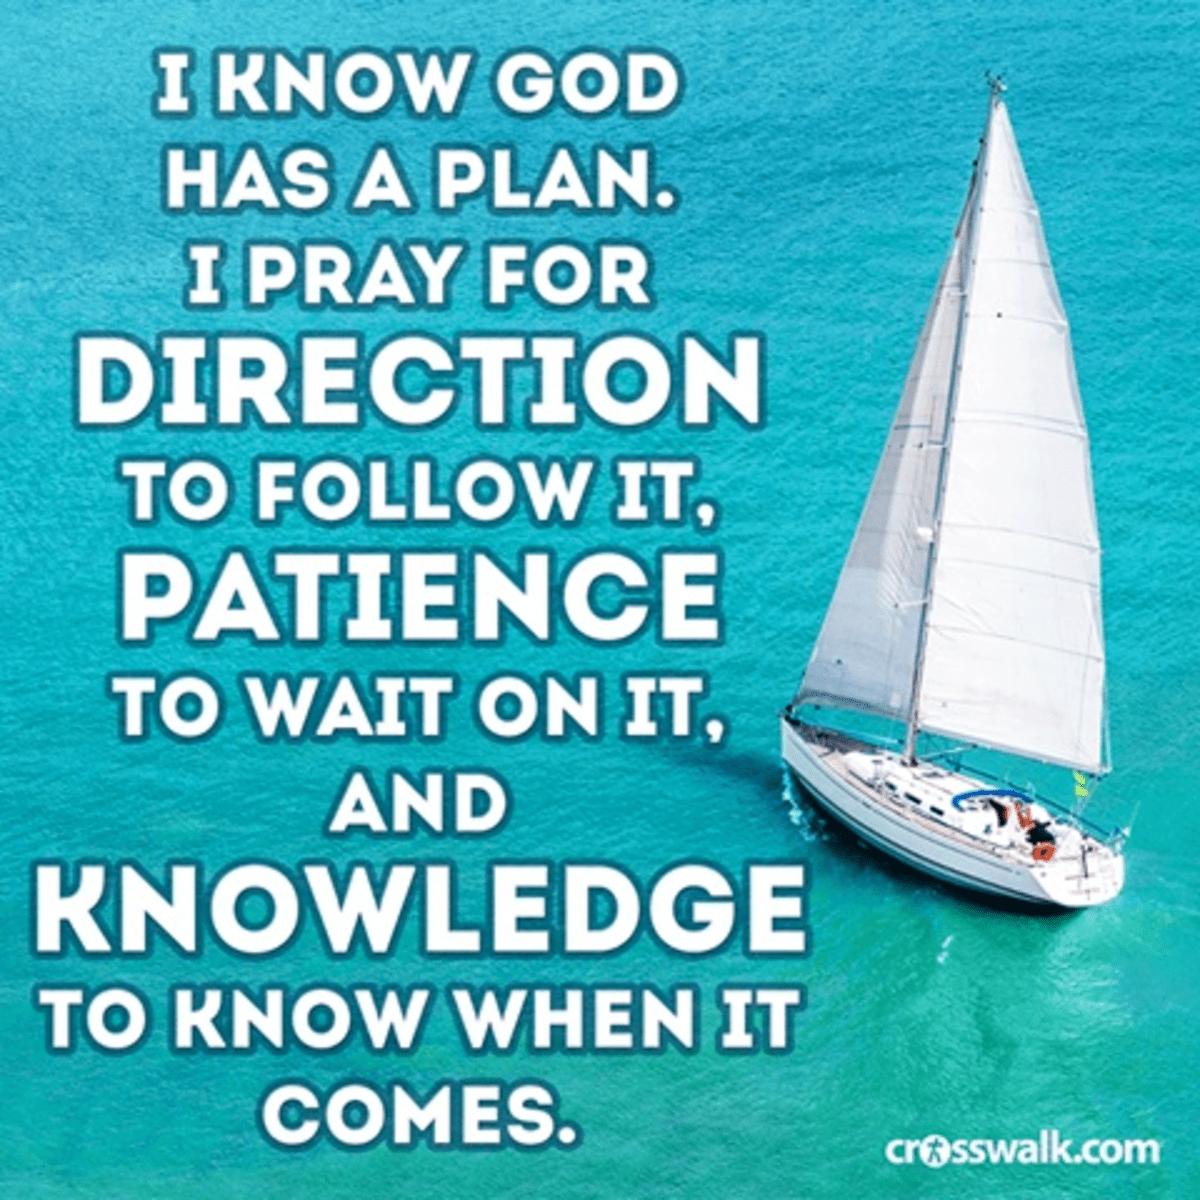 I Know God Has a Plan